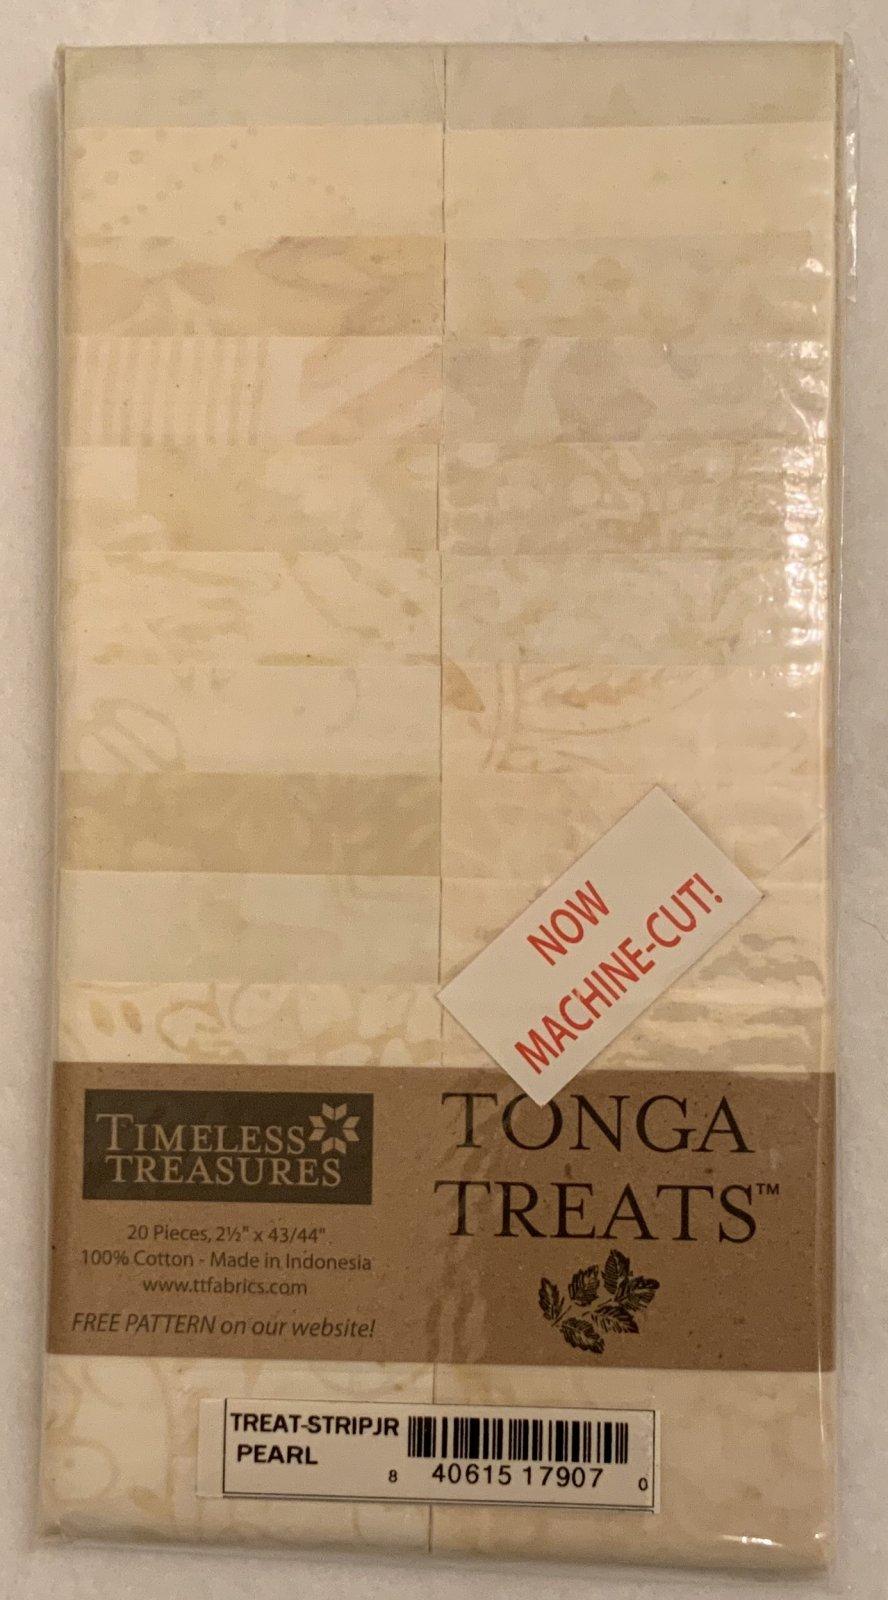 Tonga Treat Strip JR Pearl, (20 pcs 2.5 x44) - Timeless Treasures